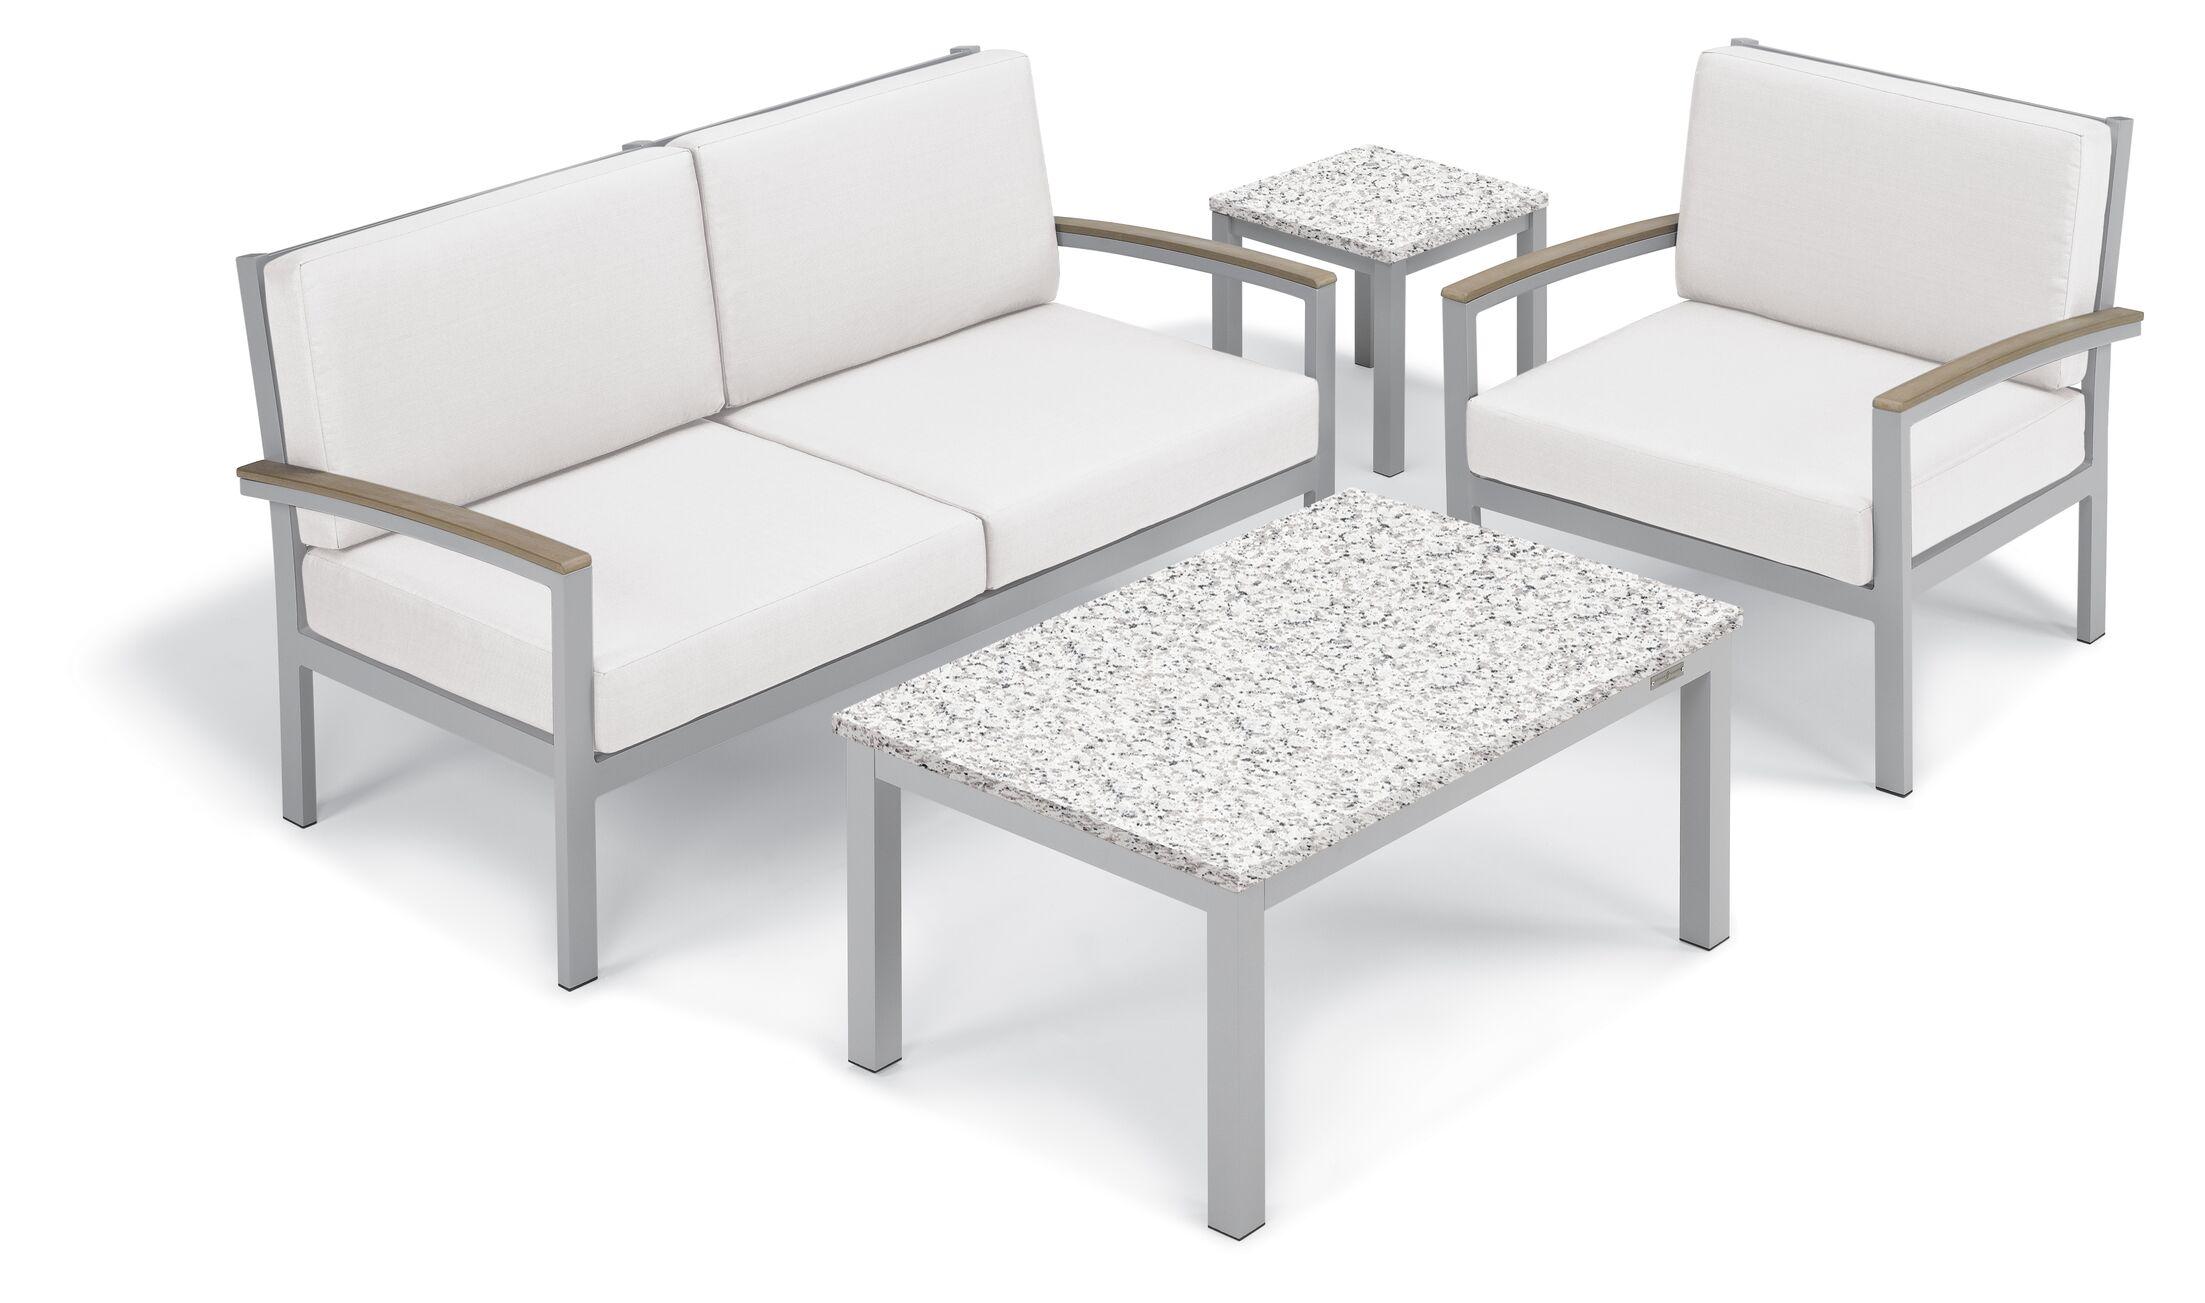 Farmington 5 Piece Sofa Set Frame Color: Vintage, Fabric: Eggshell White, Table Top Color: Ash